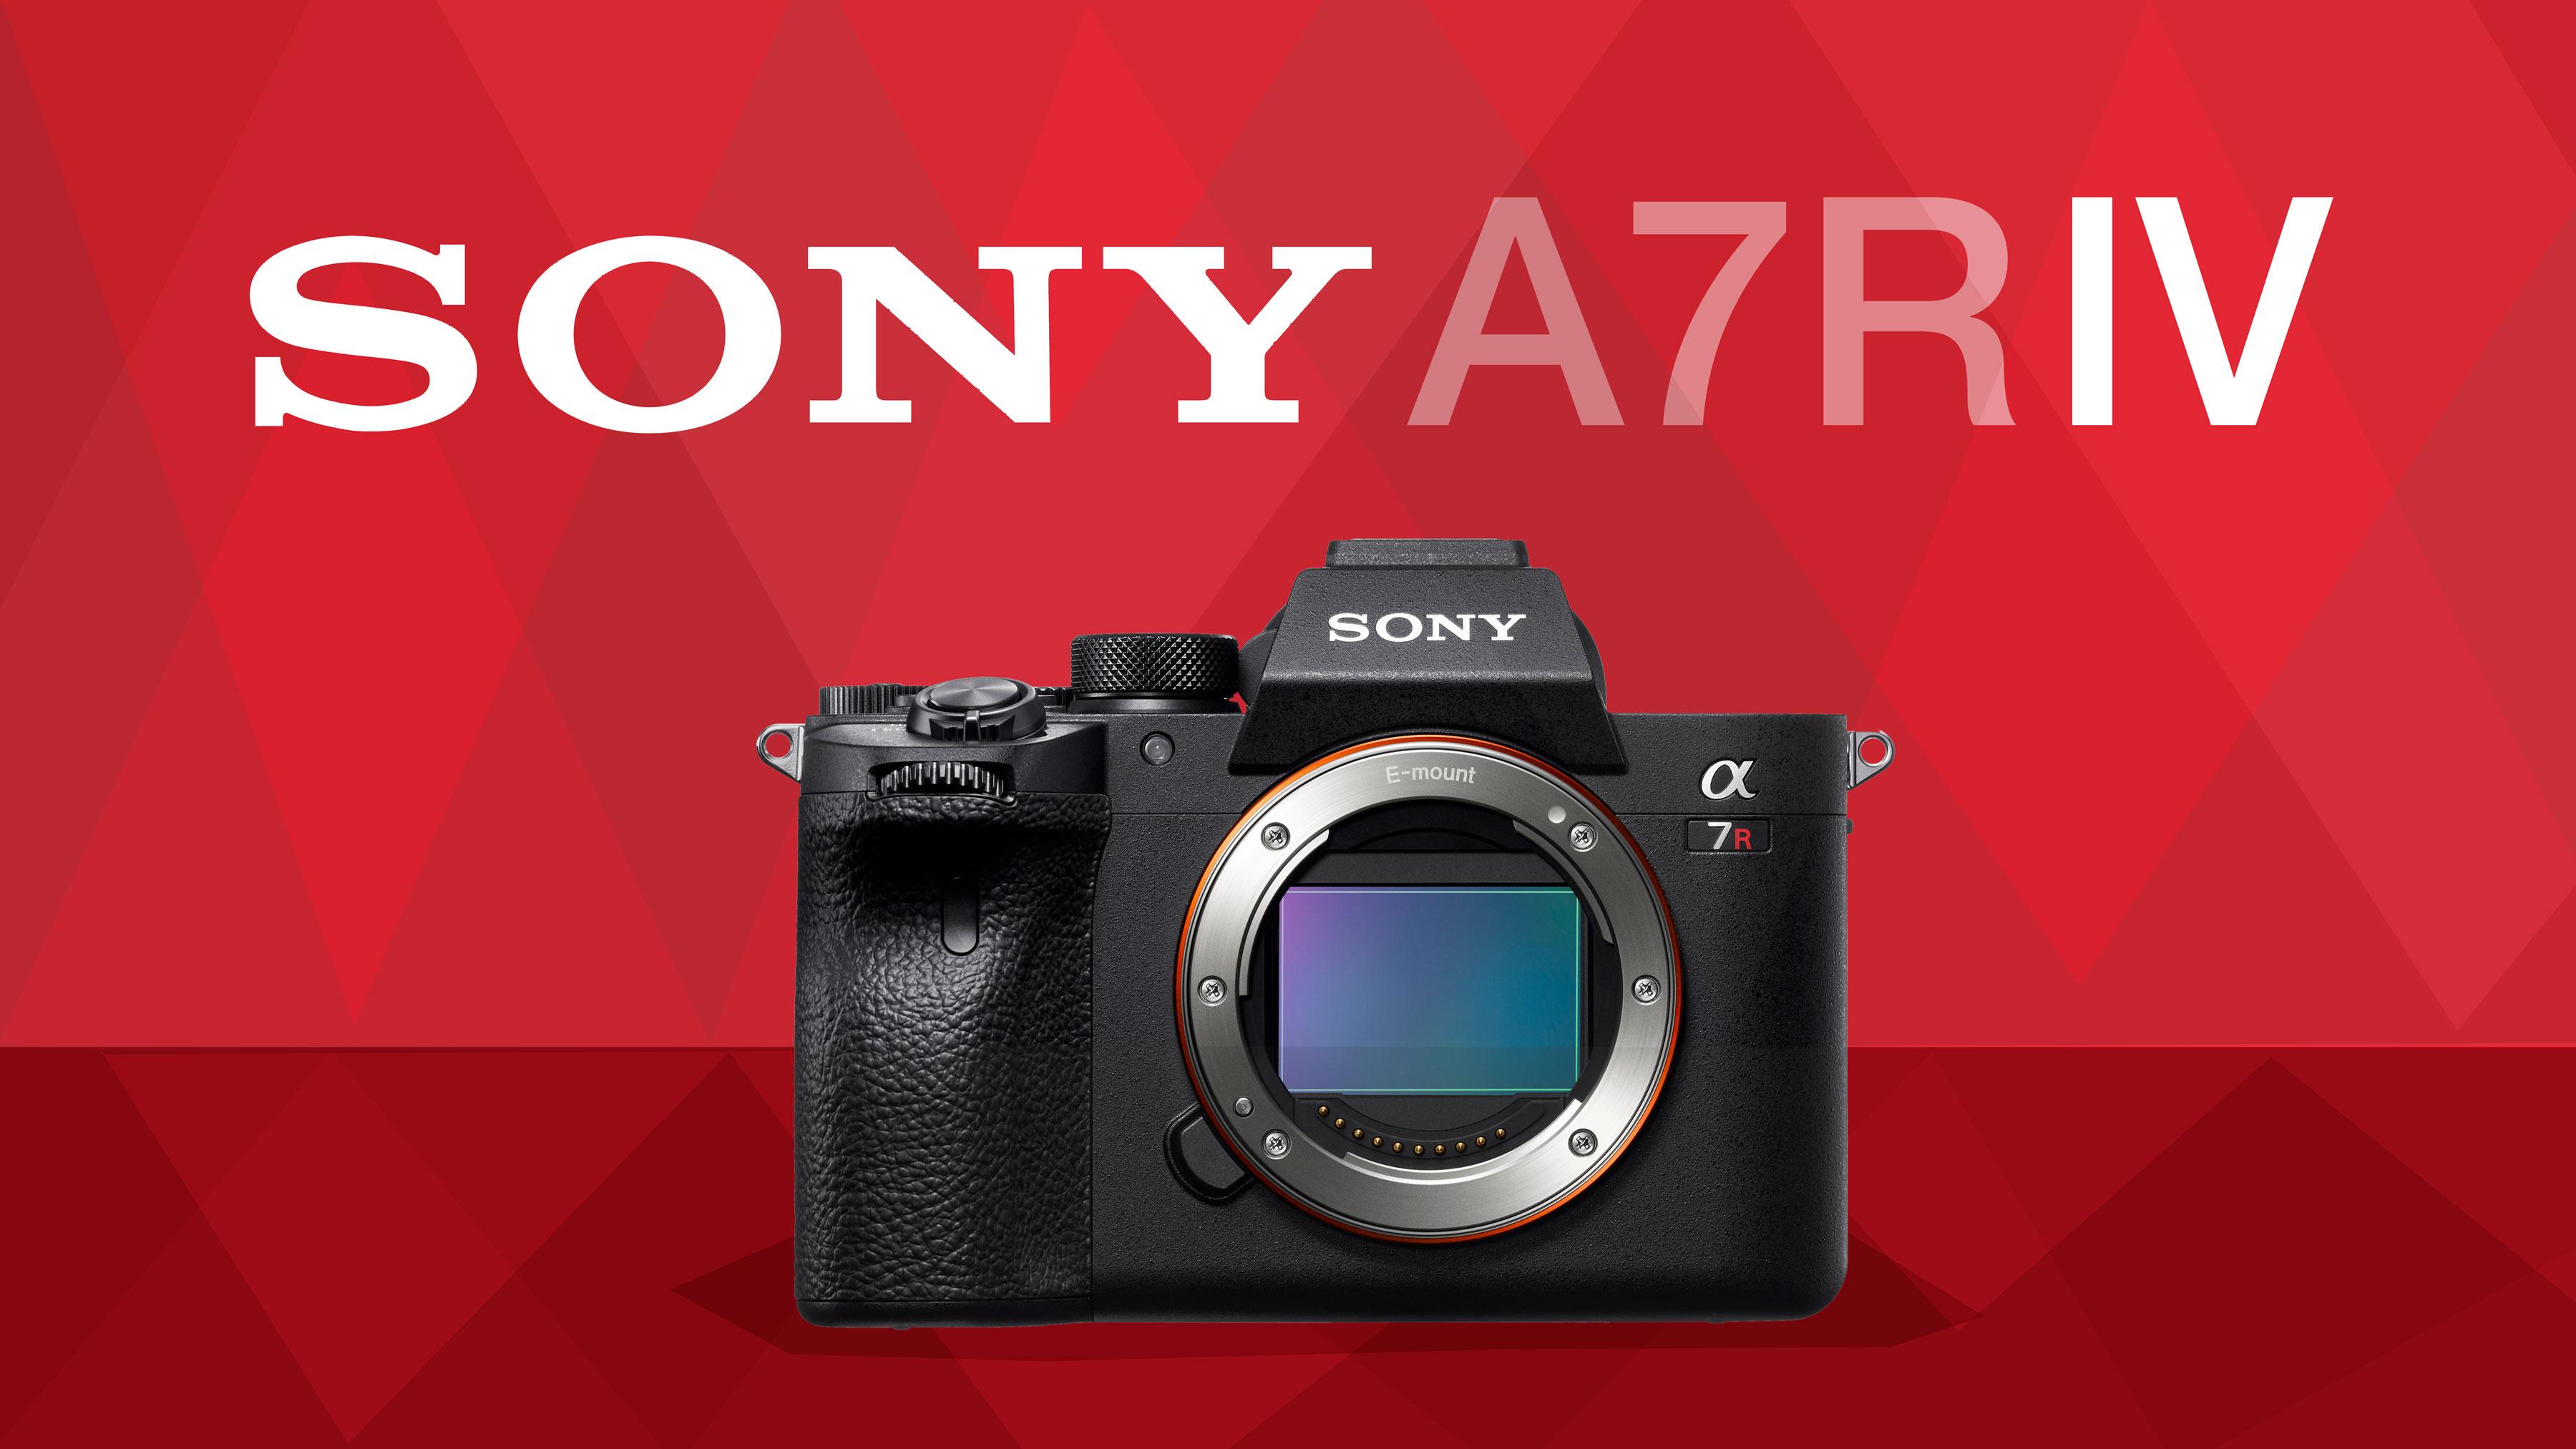 Sony Announces A7RIV: 61 Megapixel Mirrorless Full Frame